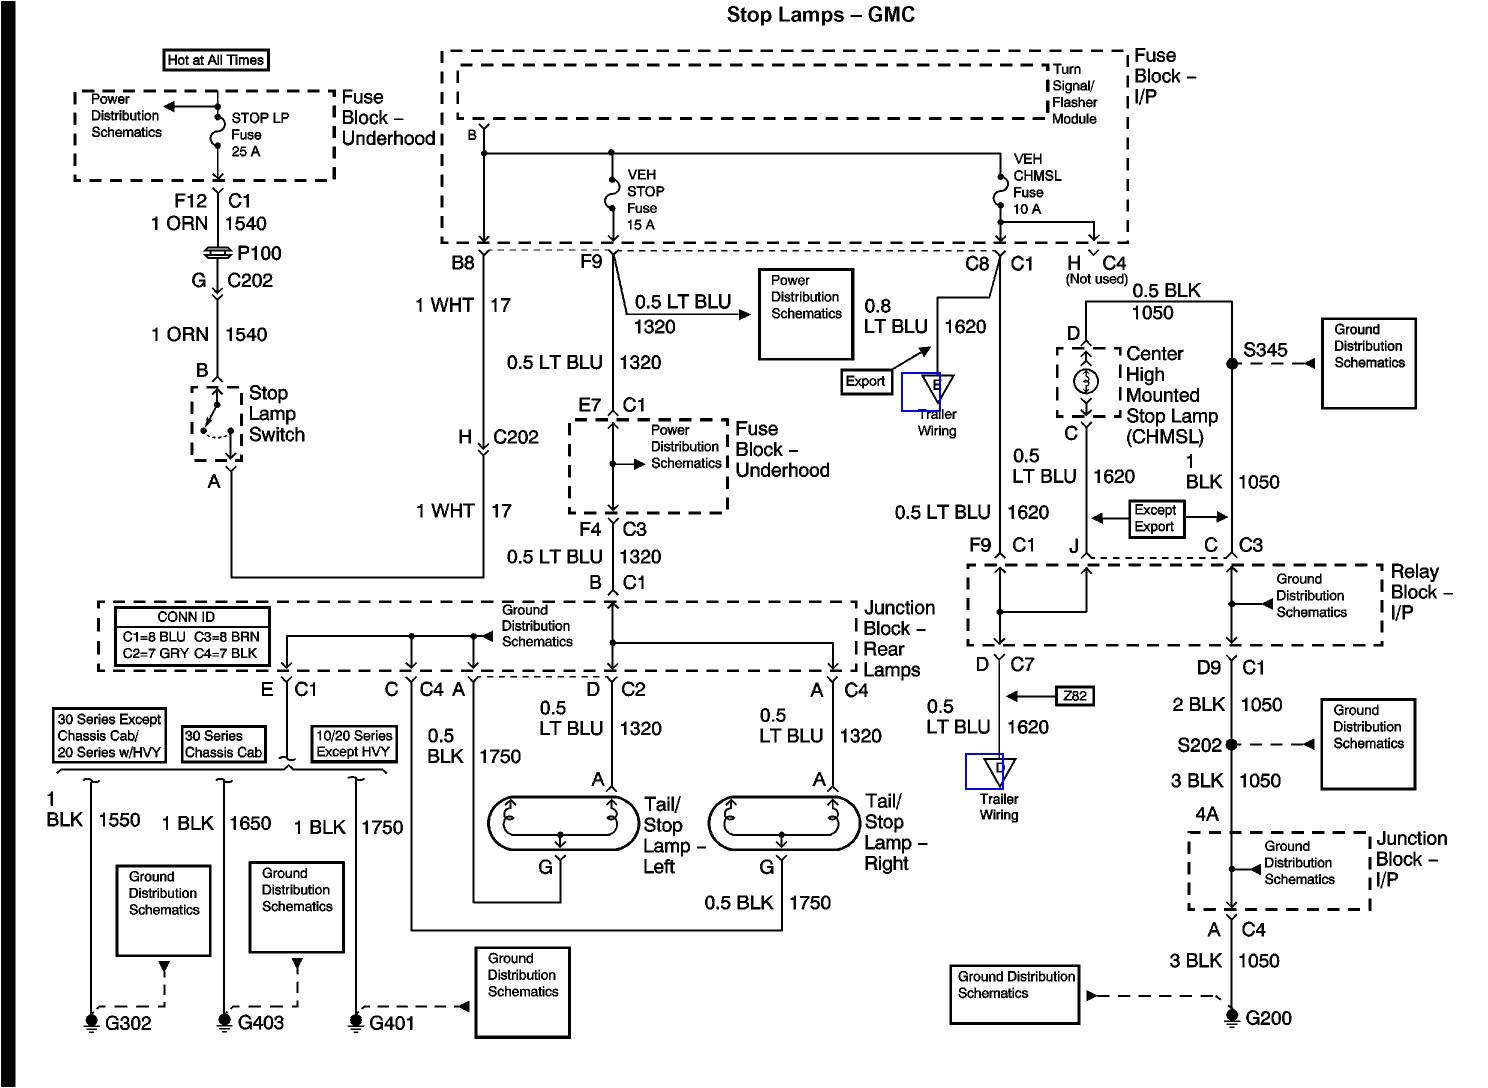 2001 chevy silverado tail light wiring diagram 2000 silverado tail light wiring diagram free download wiring jpg